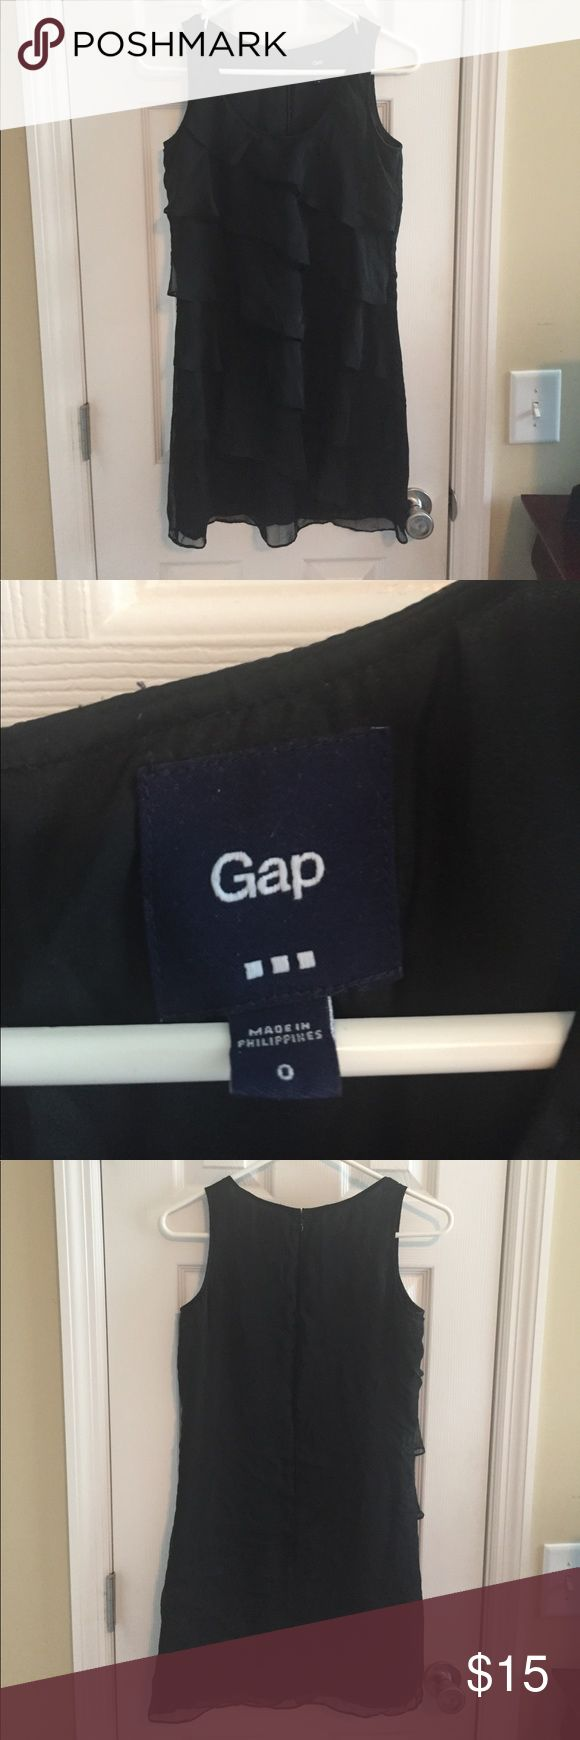 GAP black ruffle mini dress Good condition! Super cute cocktail dress! Back zipper. 100% polyester. GAP Dresses Mini